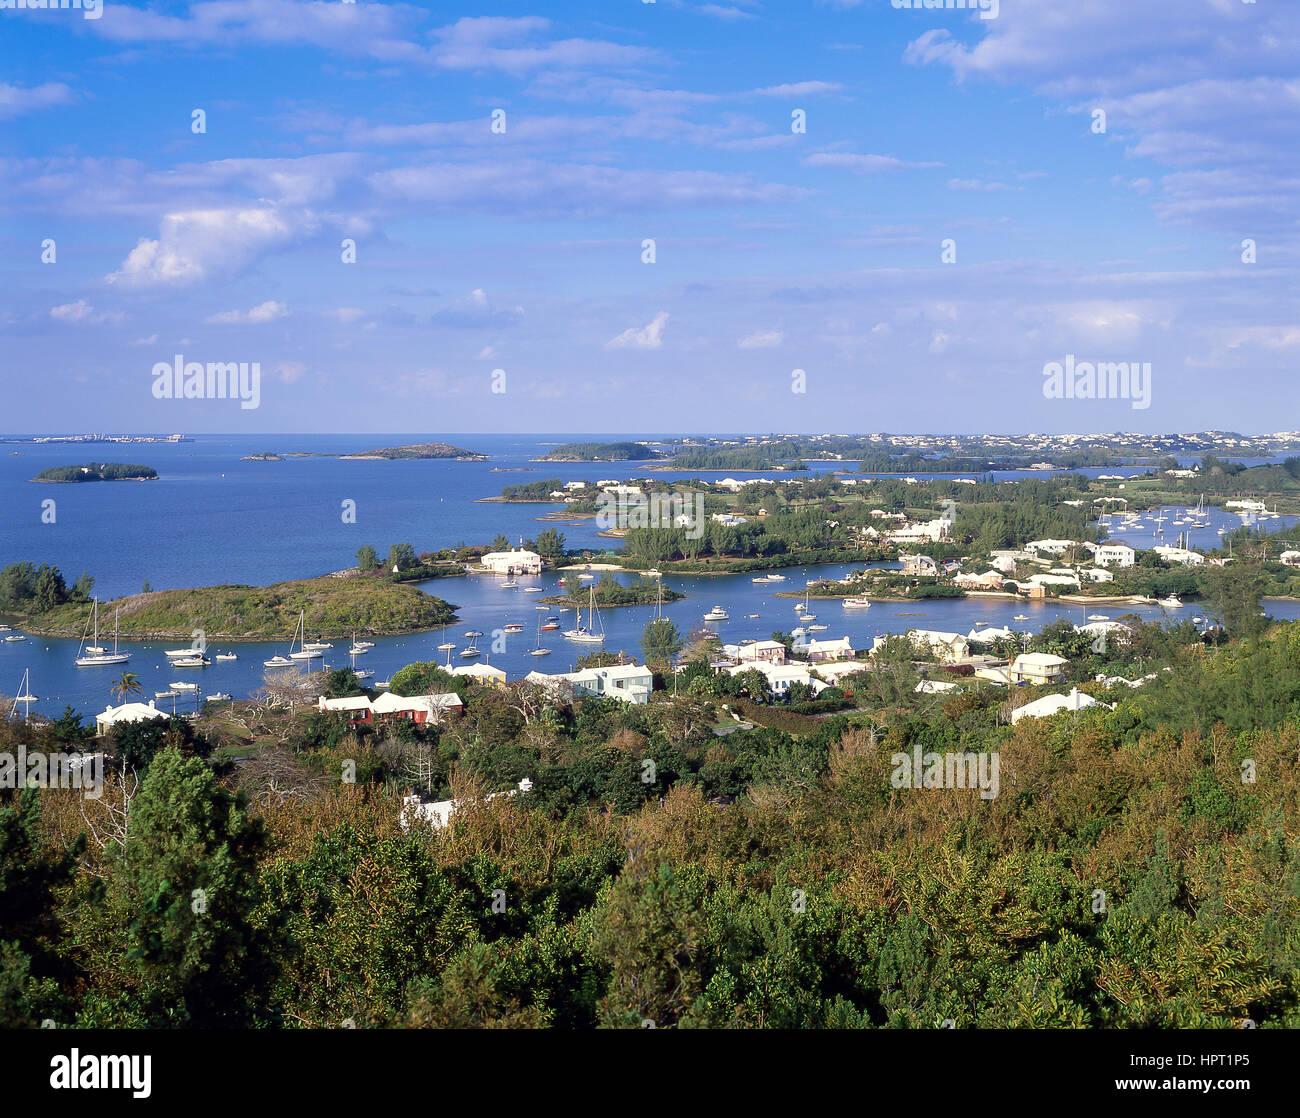 View of inlet, Jew's Bay, Southampton Parish, Bermuda - Stock Image